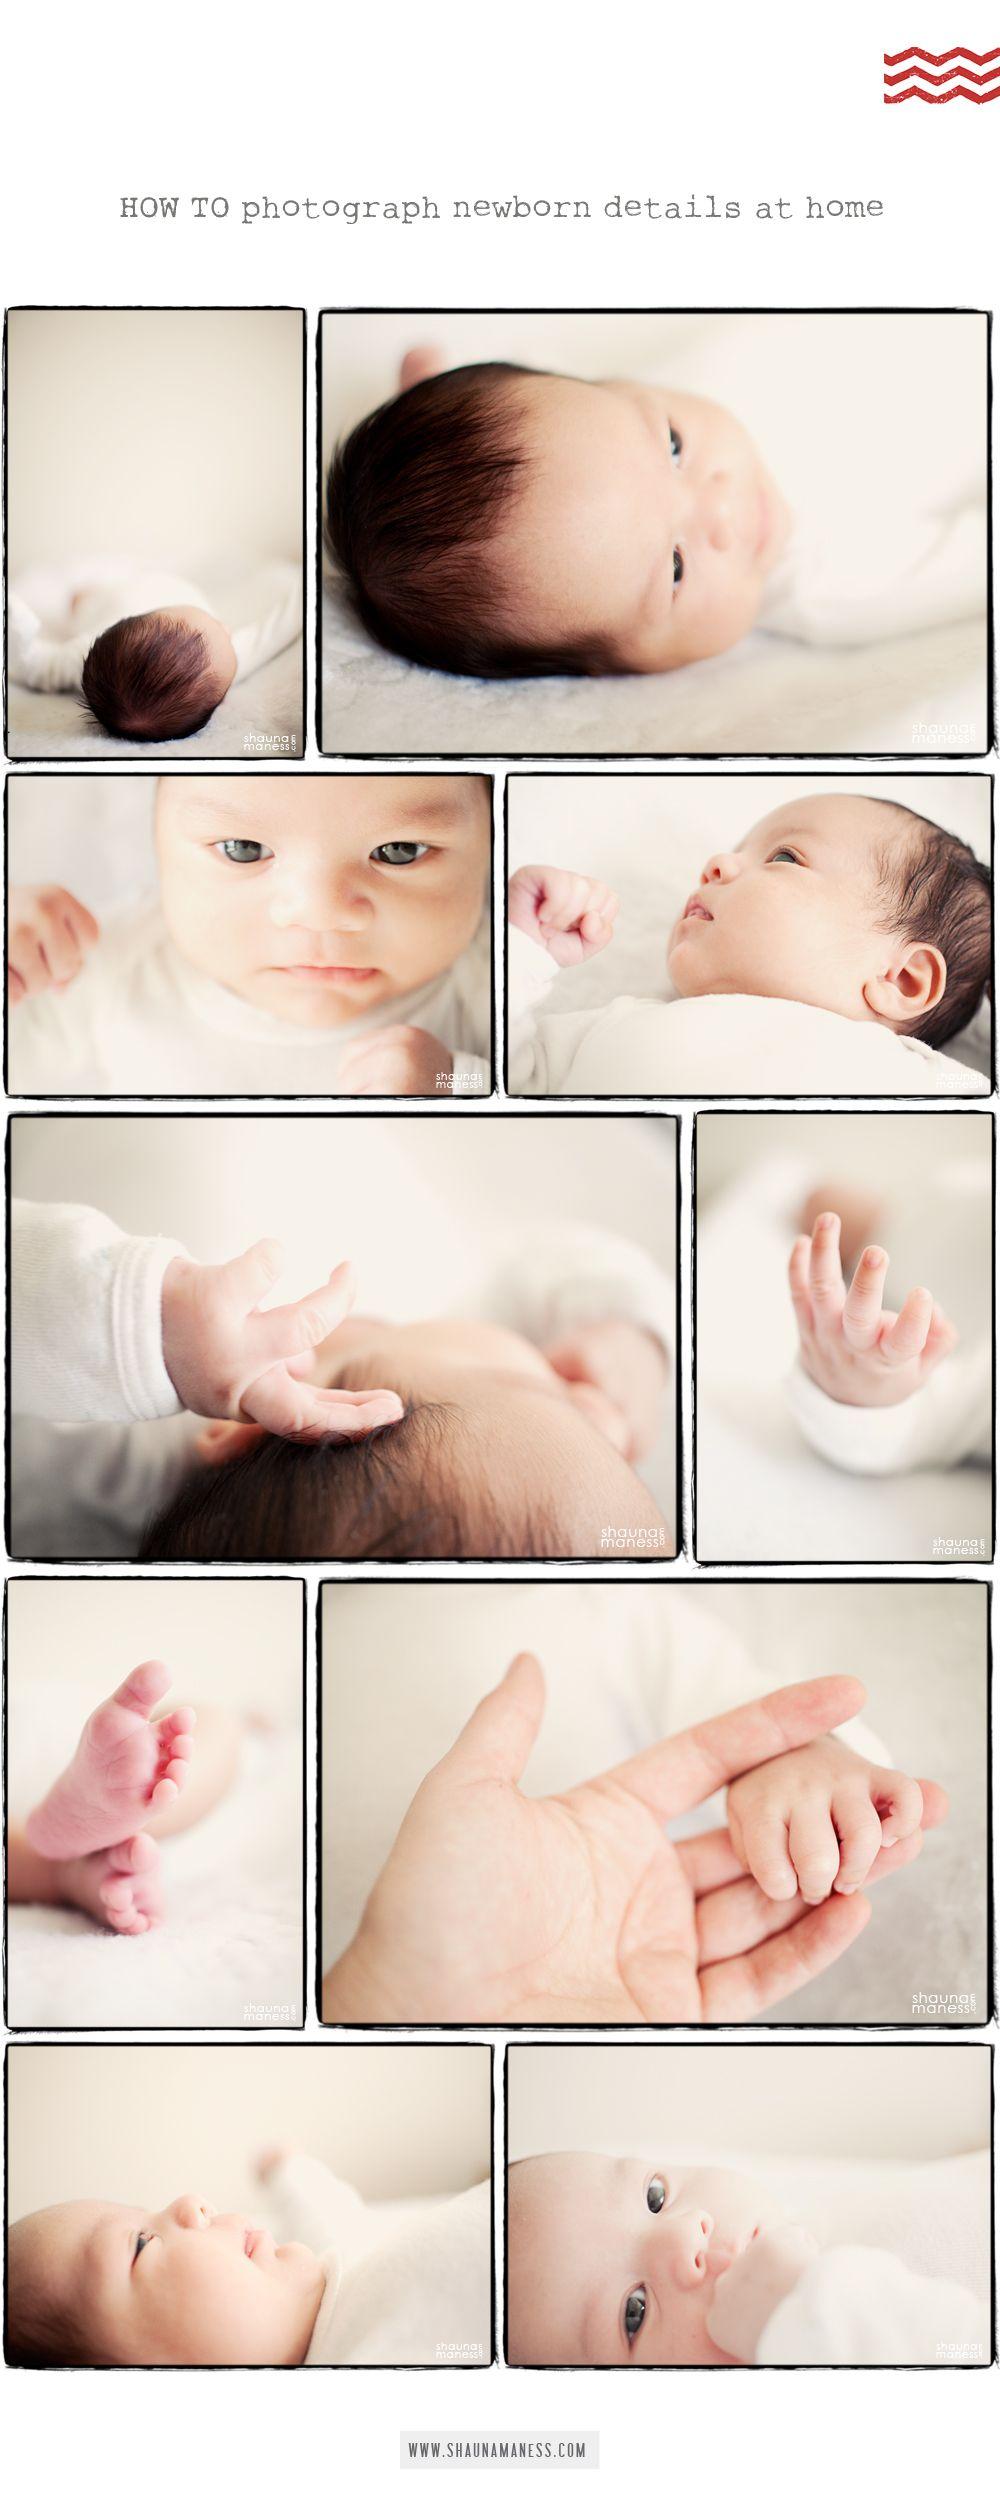 How to photograph newborn details